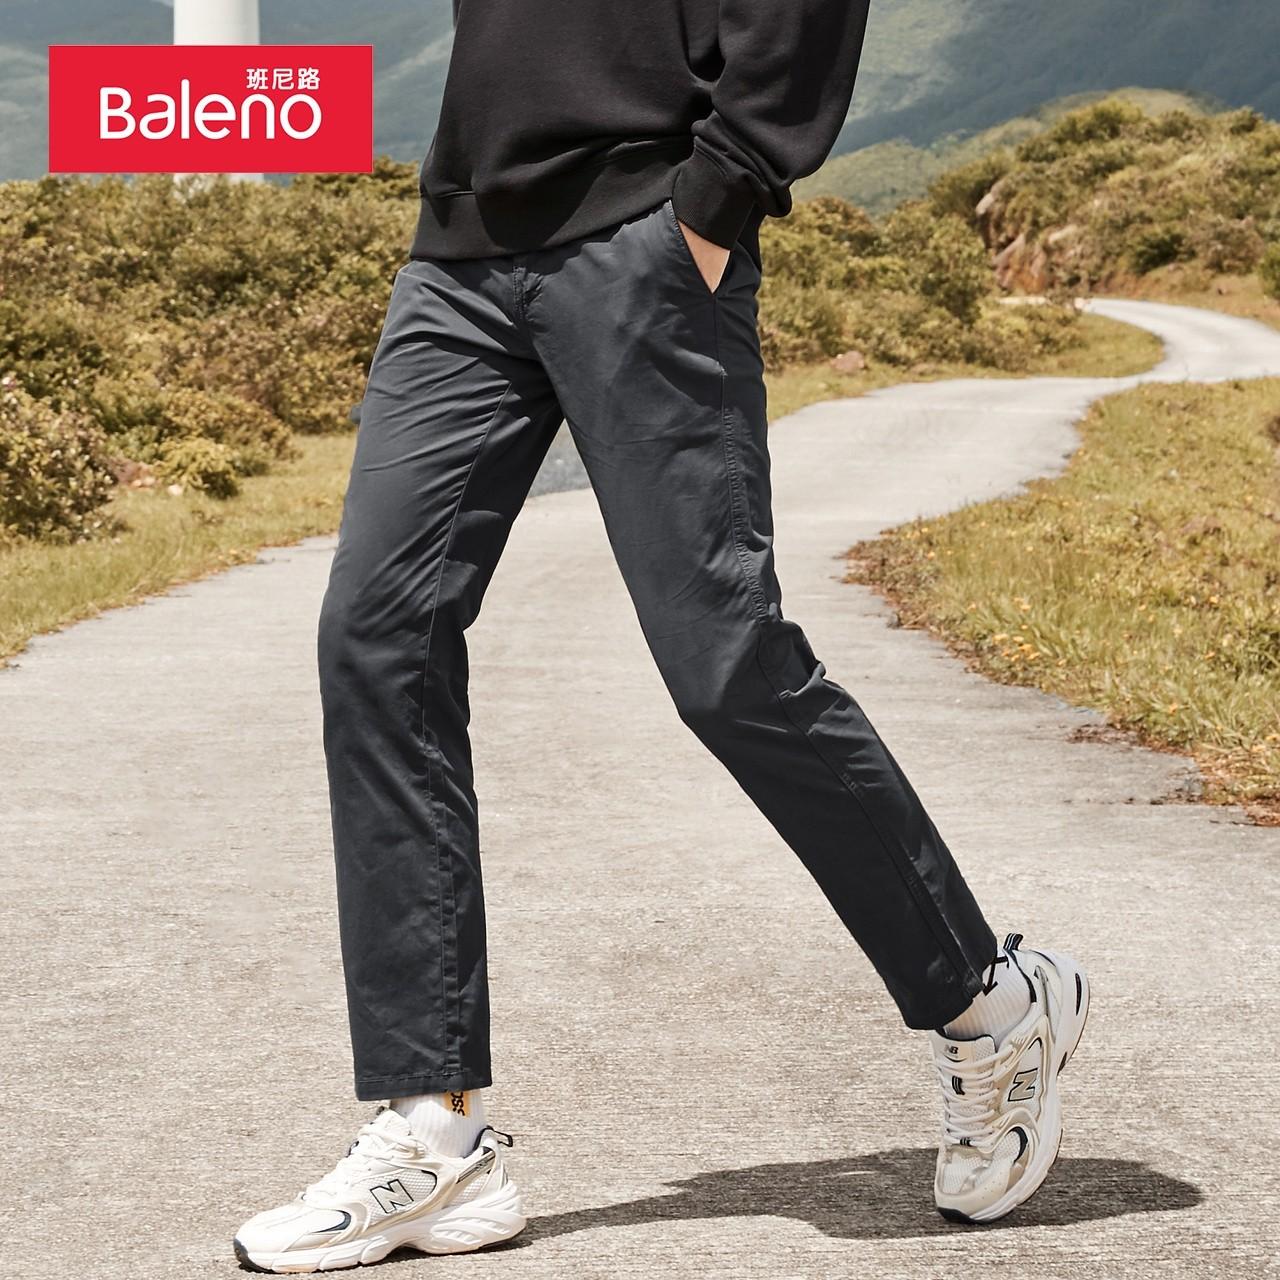 Baleno 班尼路 88842051J-307837 男士休闲裤